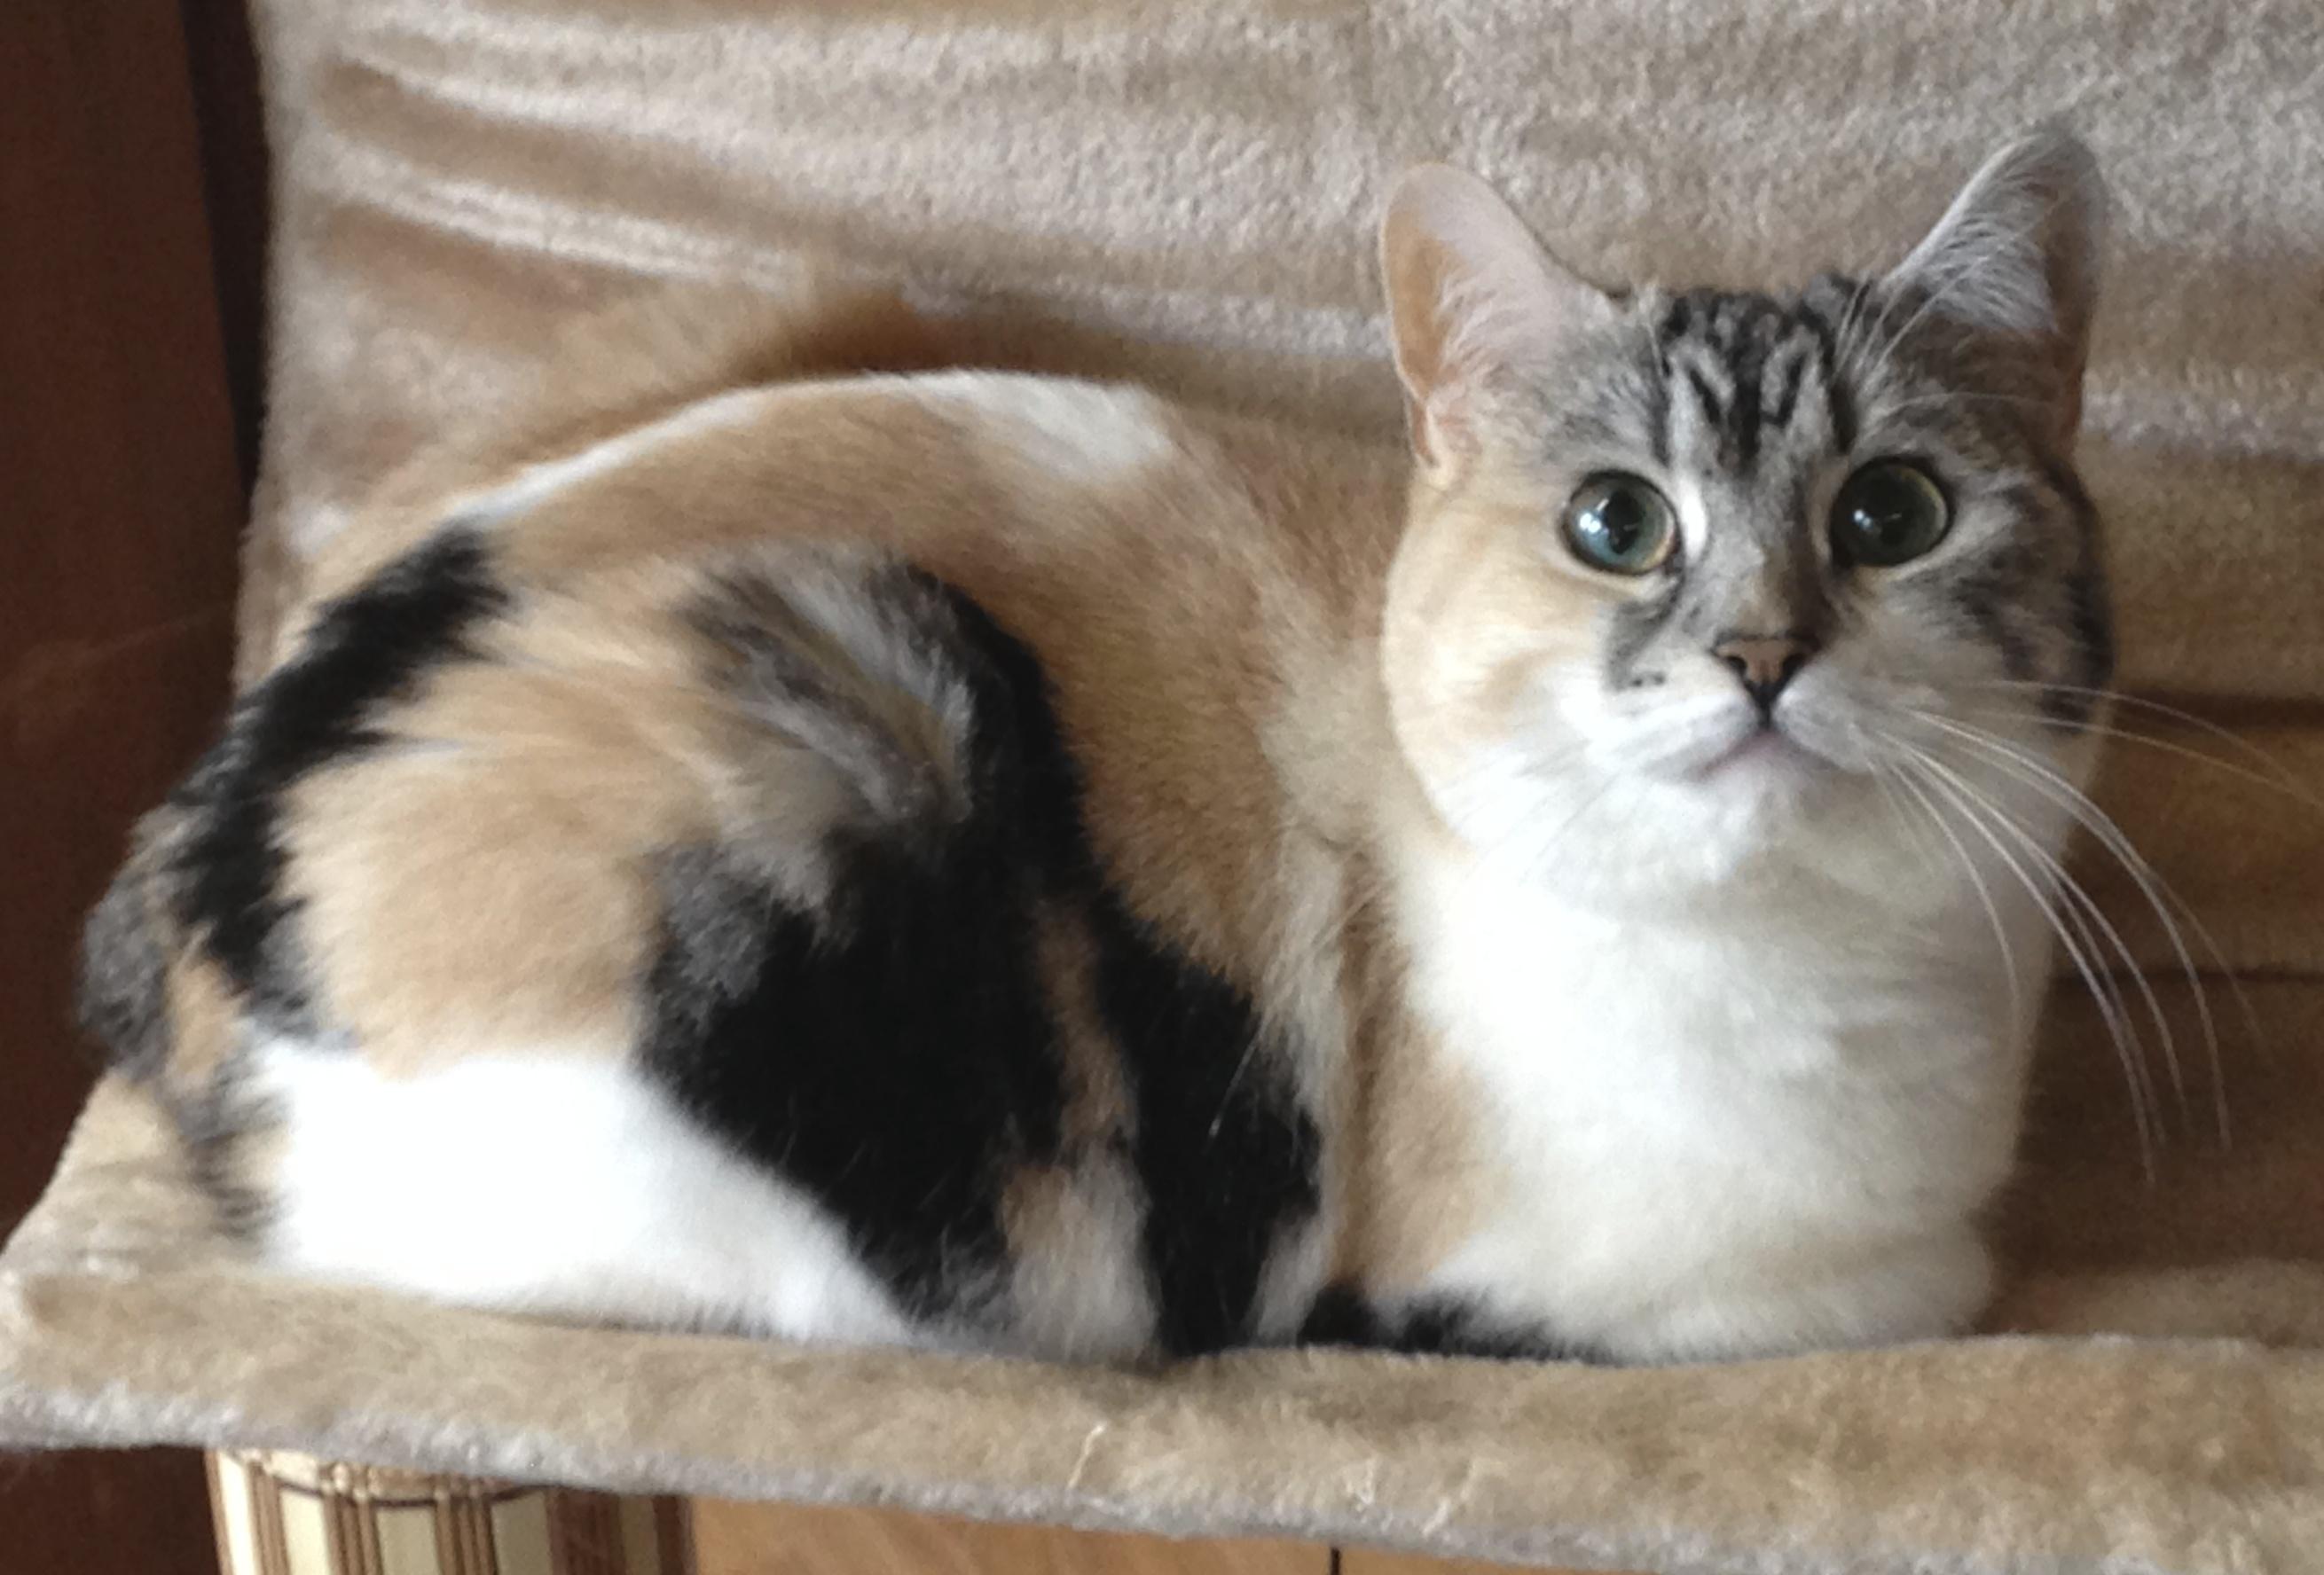 Cymric Kitten: Cymric Cats Kittens Breed